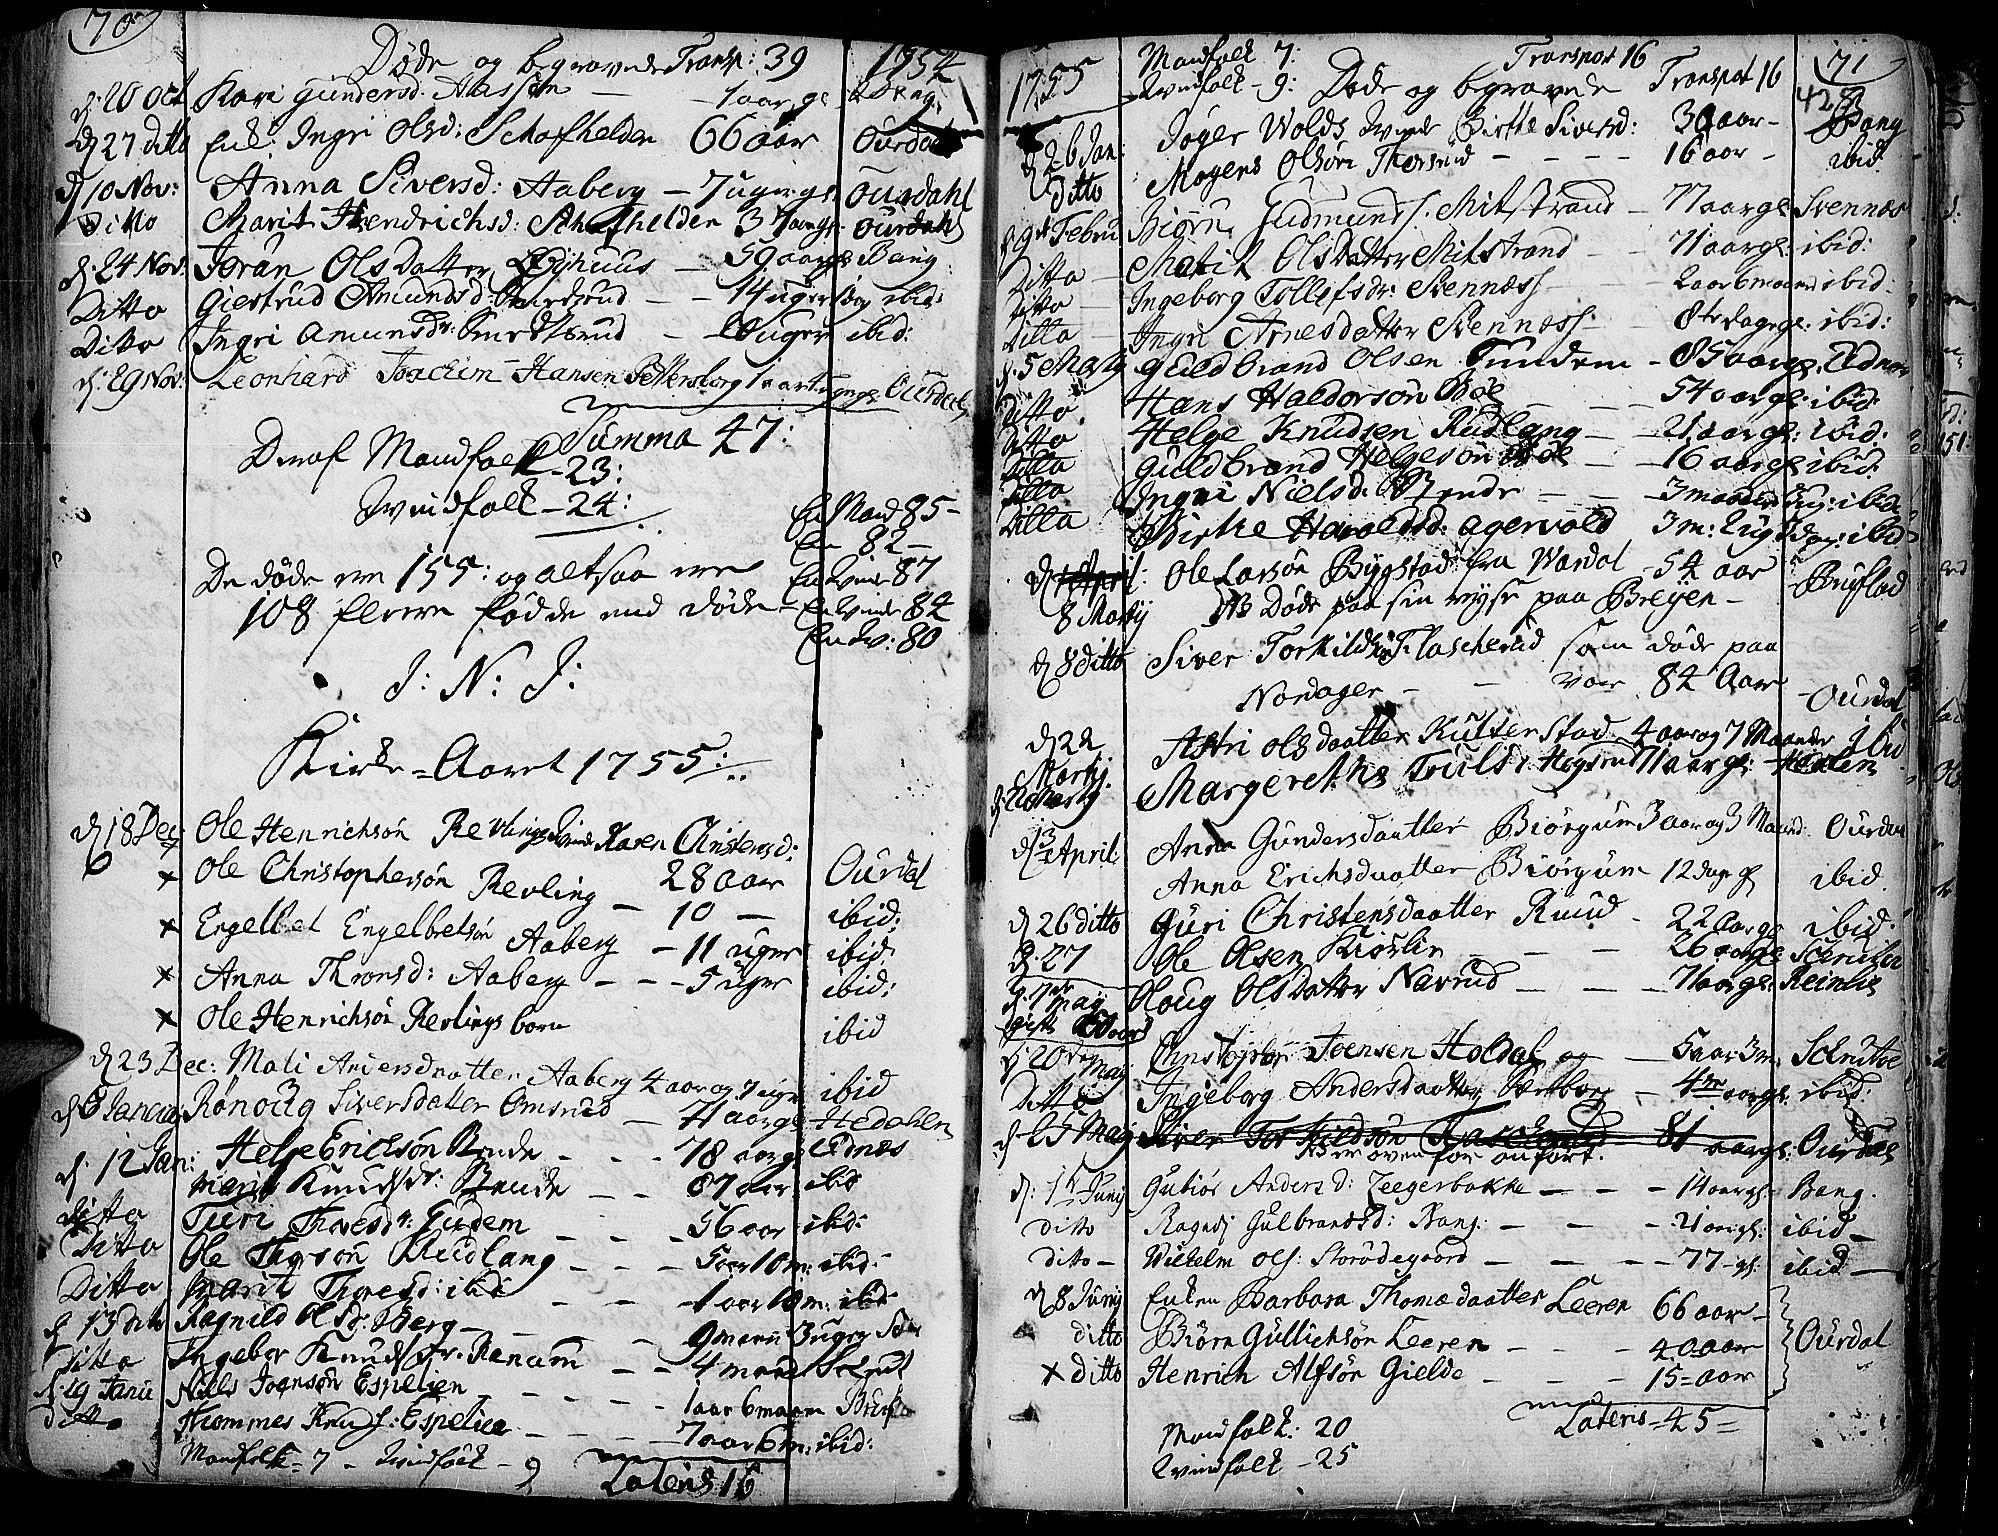 SAH, Aurdal prestekontor, Ministerialbok nr. 4, 1730-1762, s. 70-71